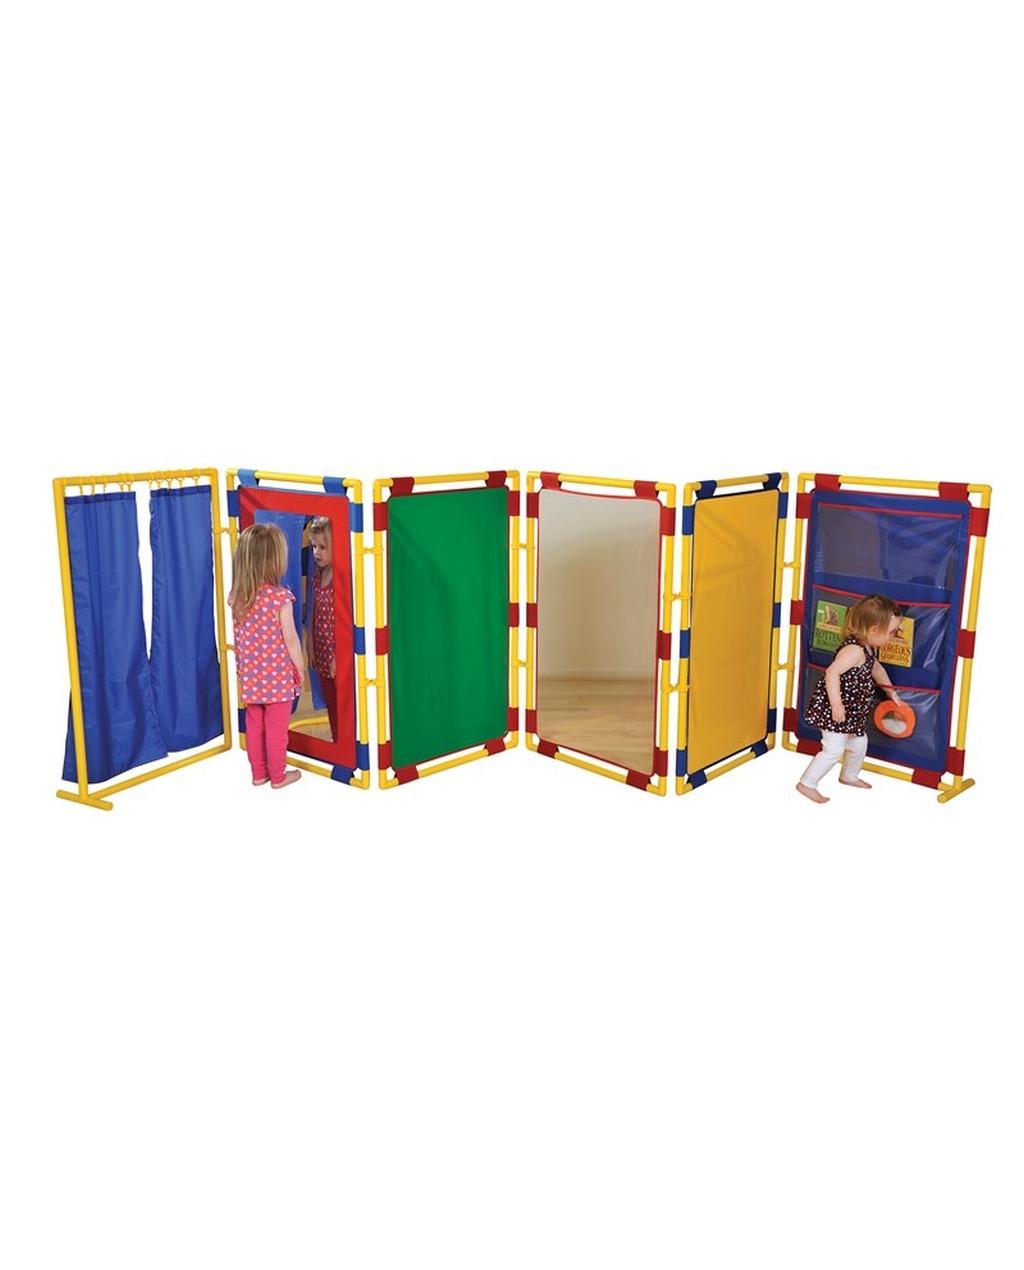 6 Activity Panels - Large